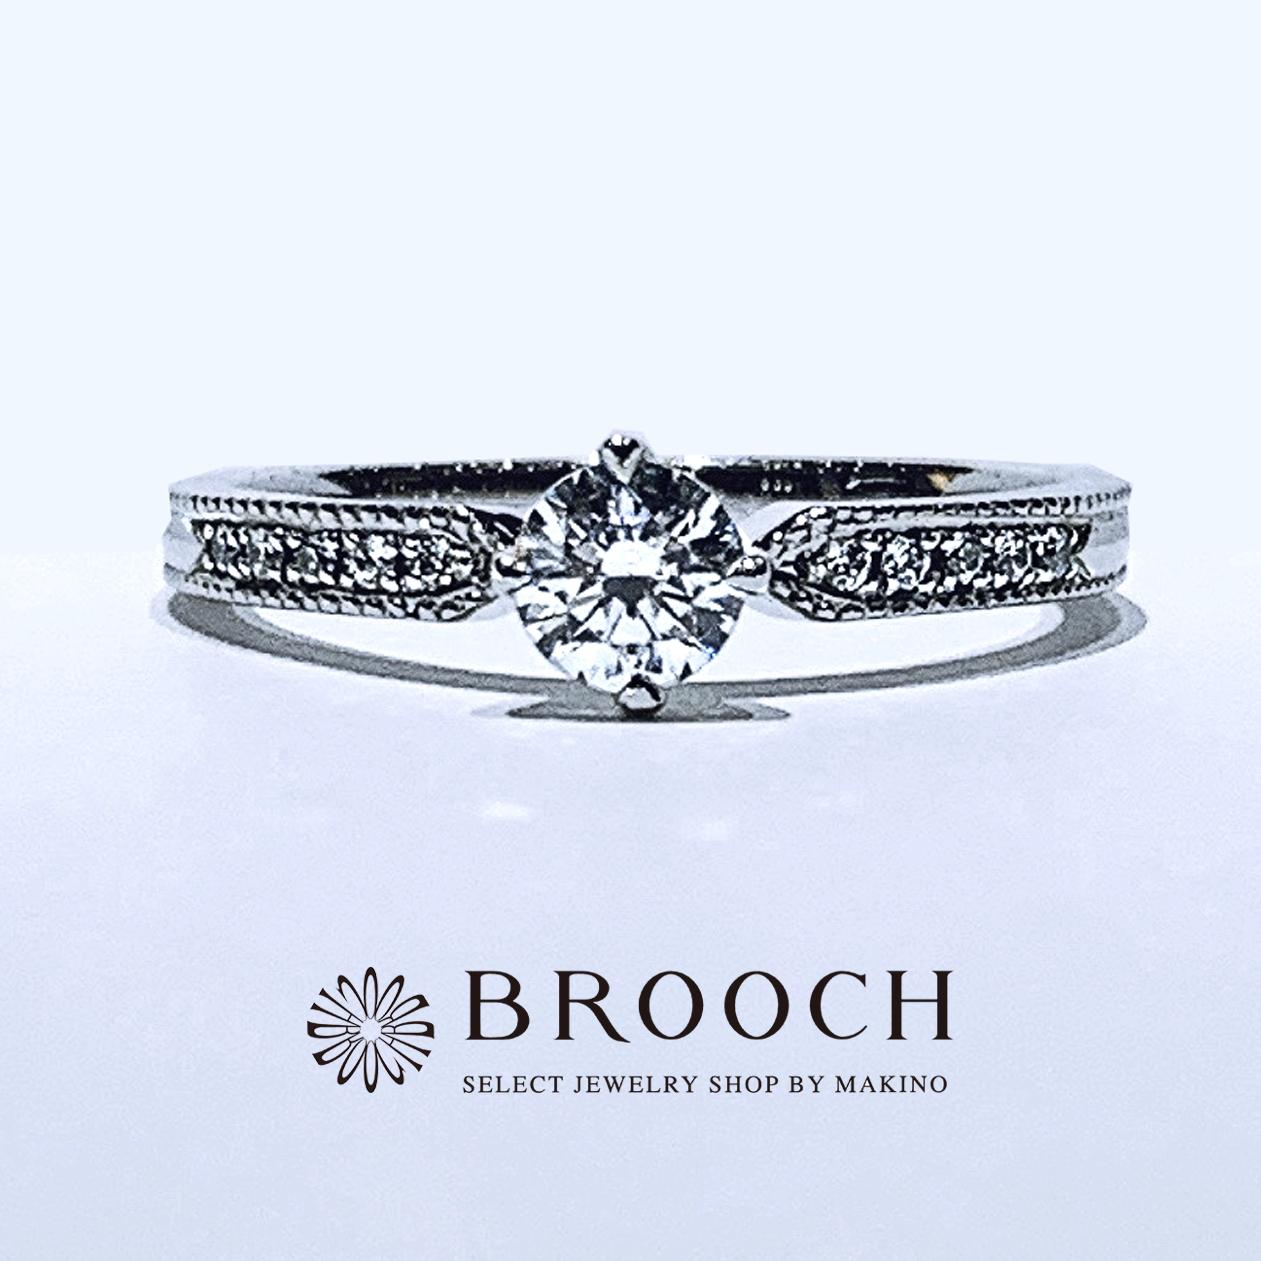 BROOCH 婚約指輪 エンゲージリング シンプル華やかなデザイン